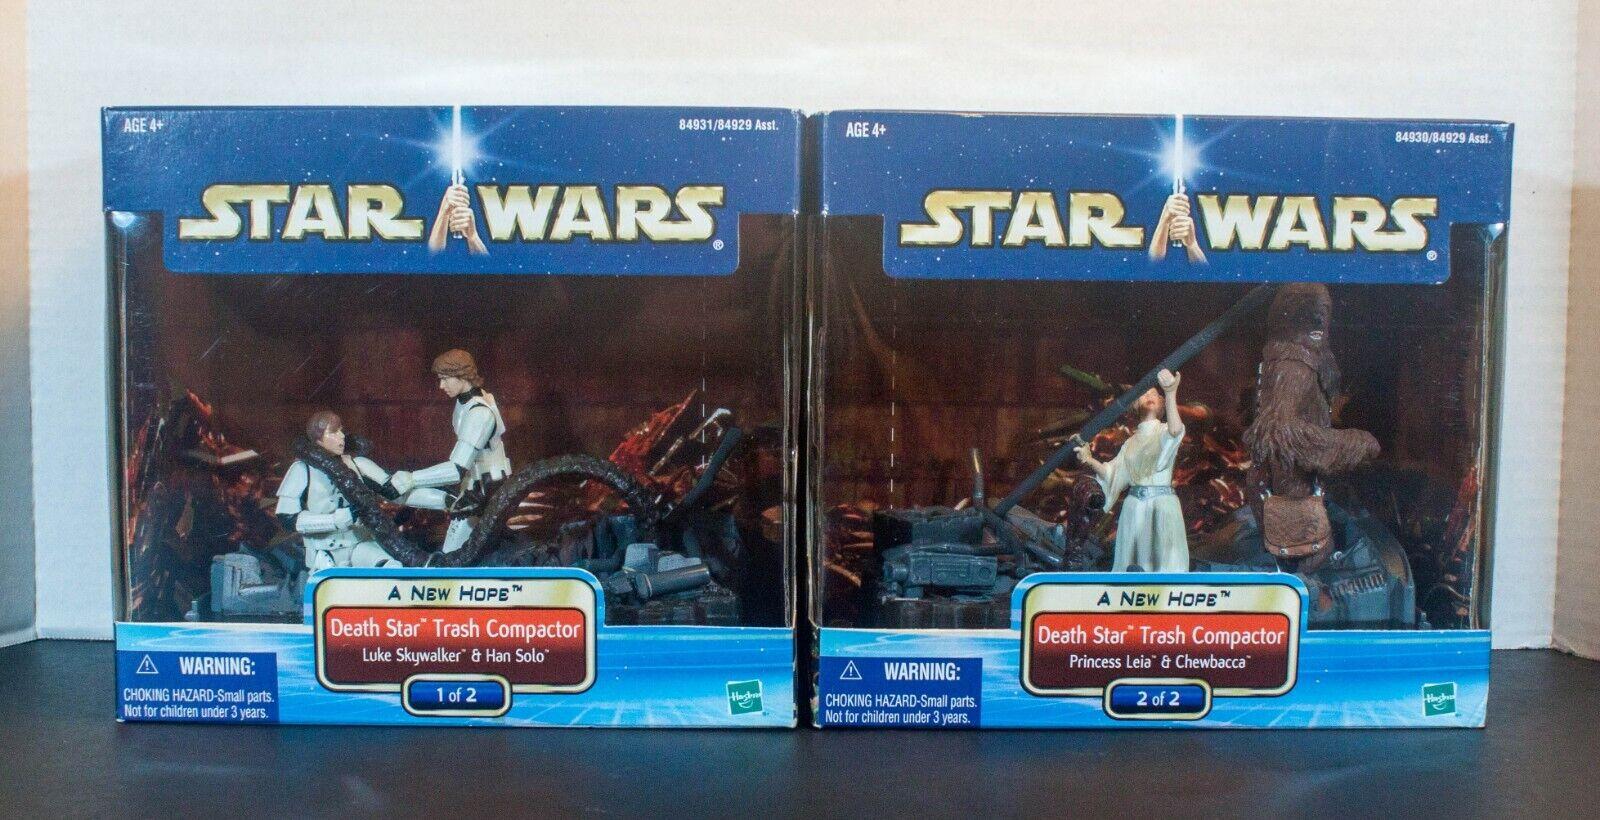 STAR WARS Saga Death Star Trash Compactor Set 1 - NEW 2002